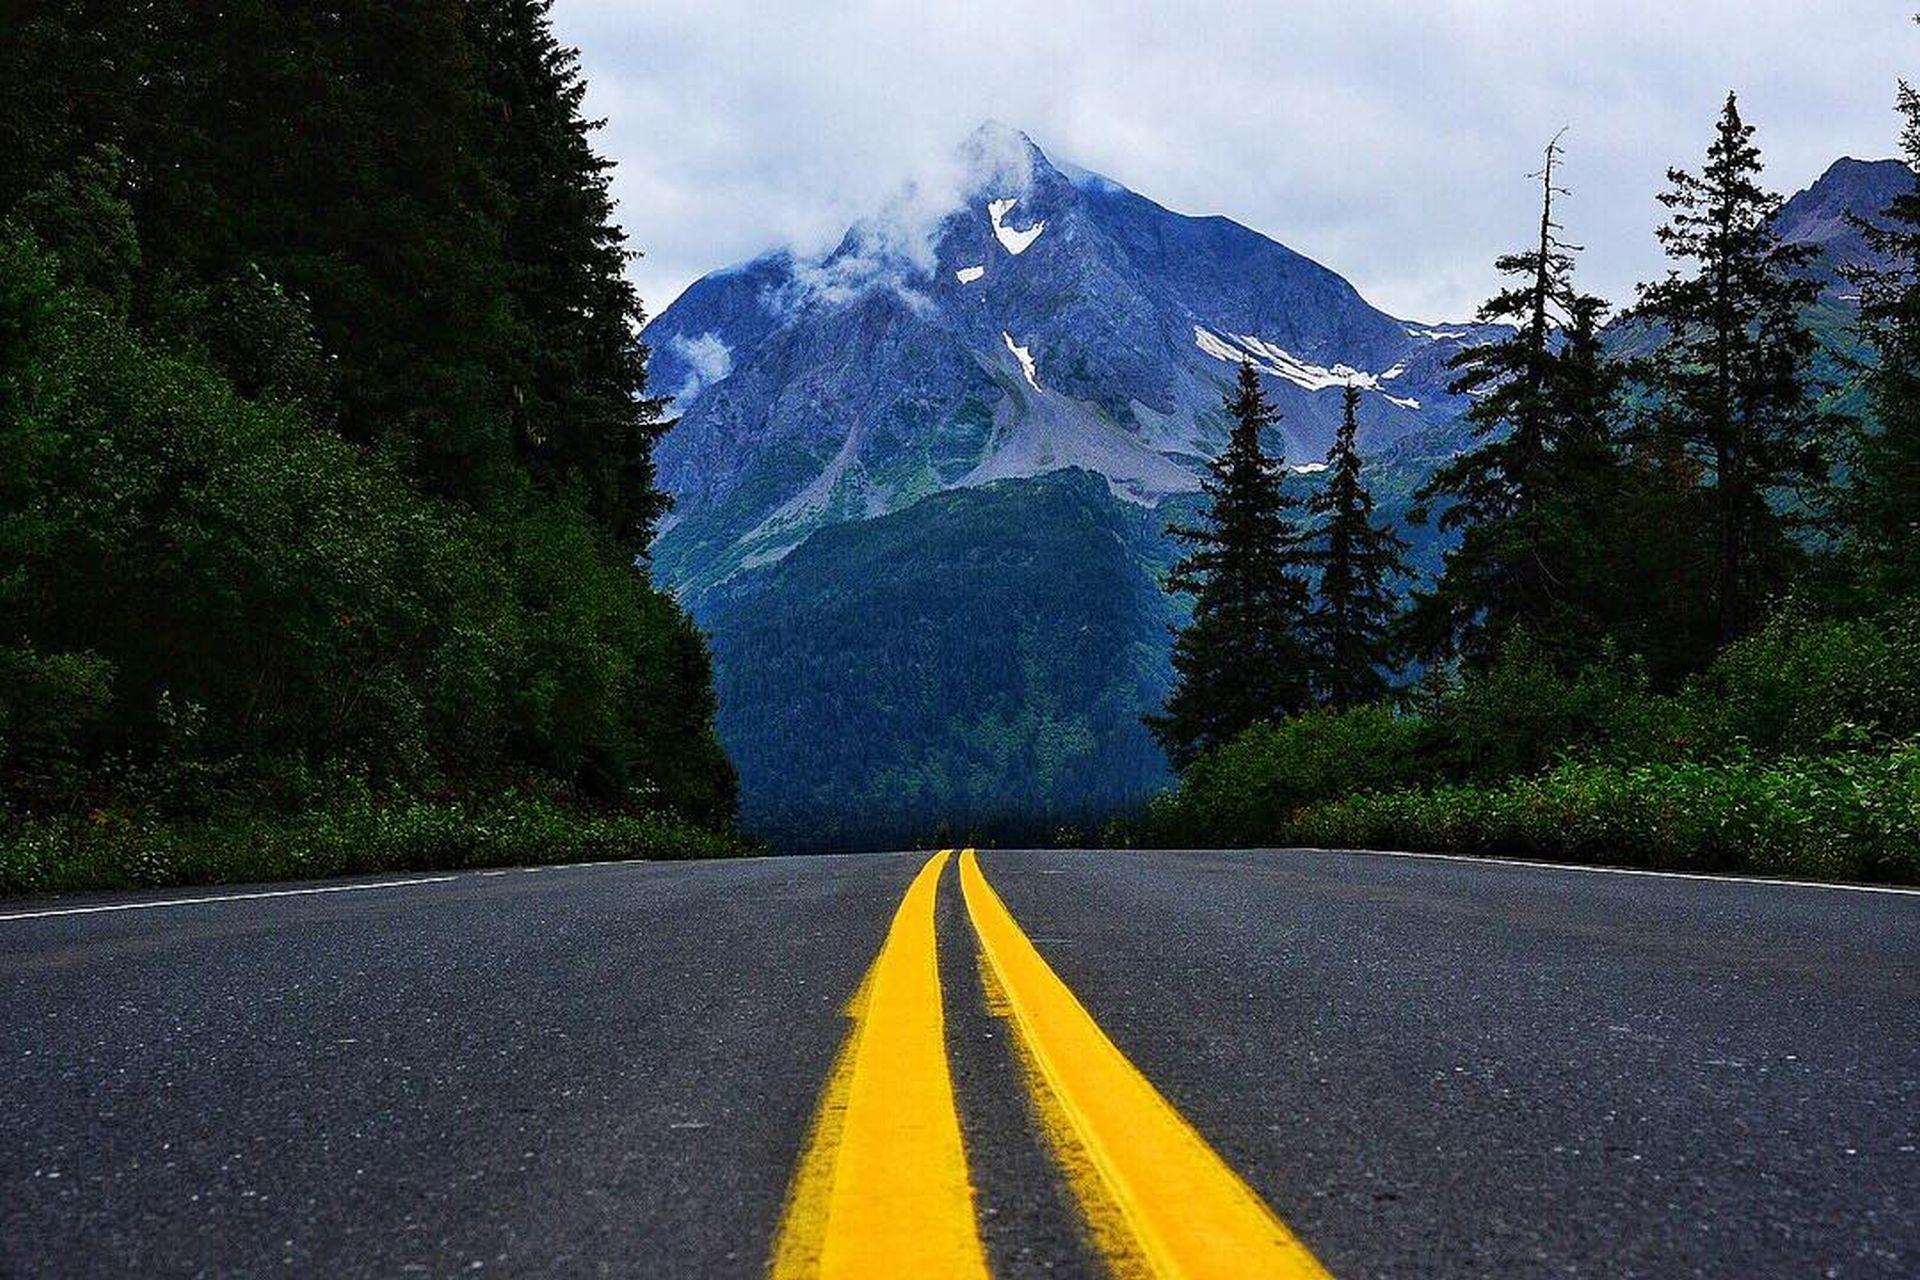 Alaska 🇺🇸 Biuro podróży Goforworld by Kuźniar